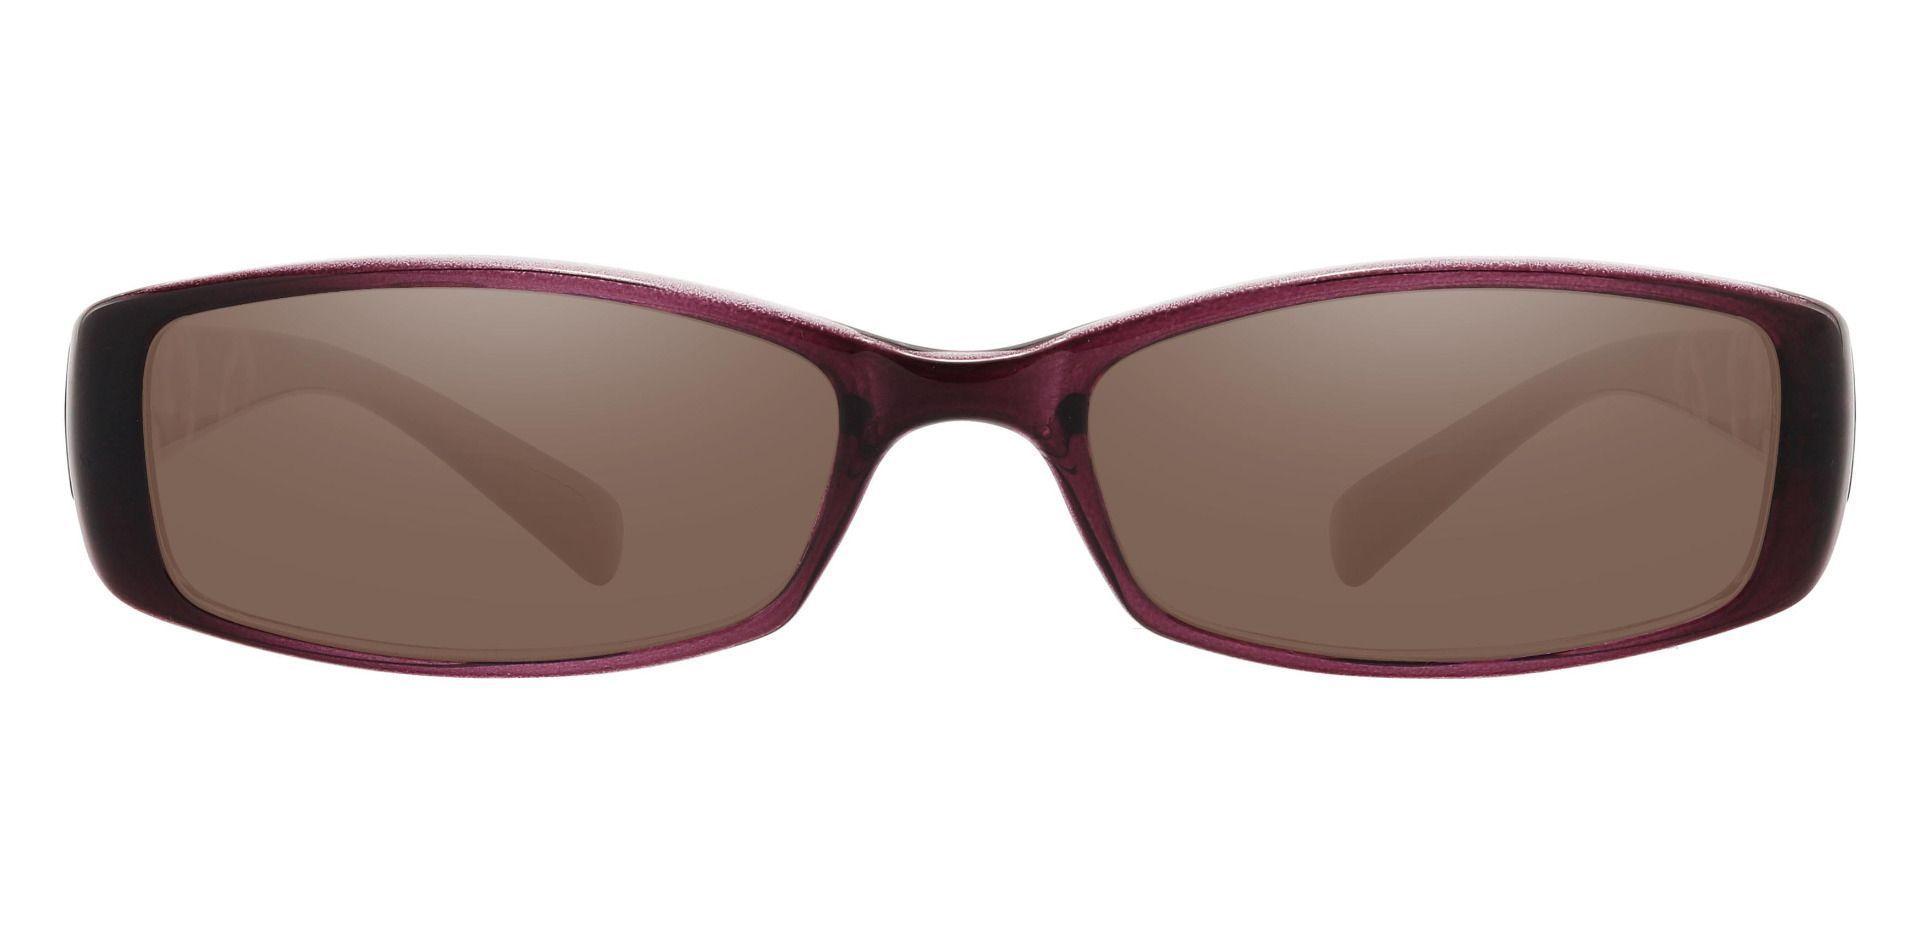 Medora Rectangle Single Vision Sunglasses - Purple Frame With Brown Lenses